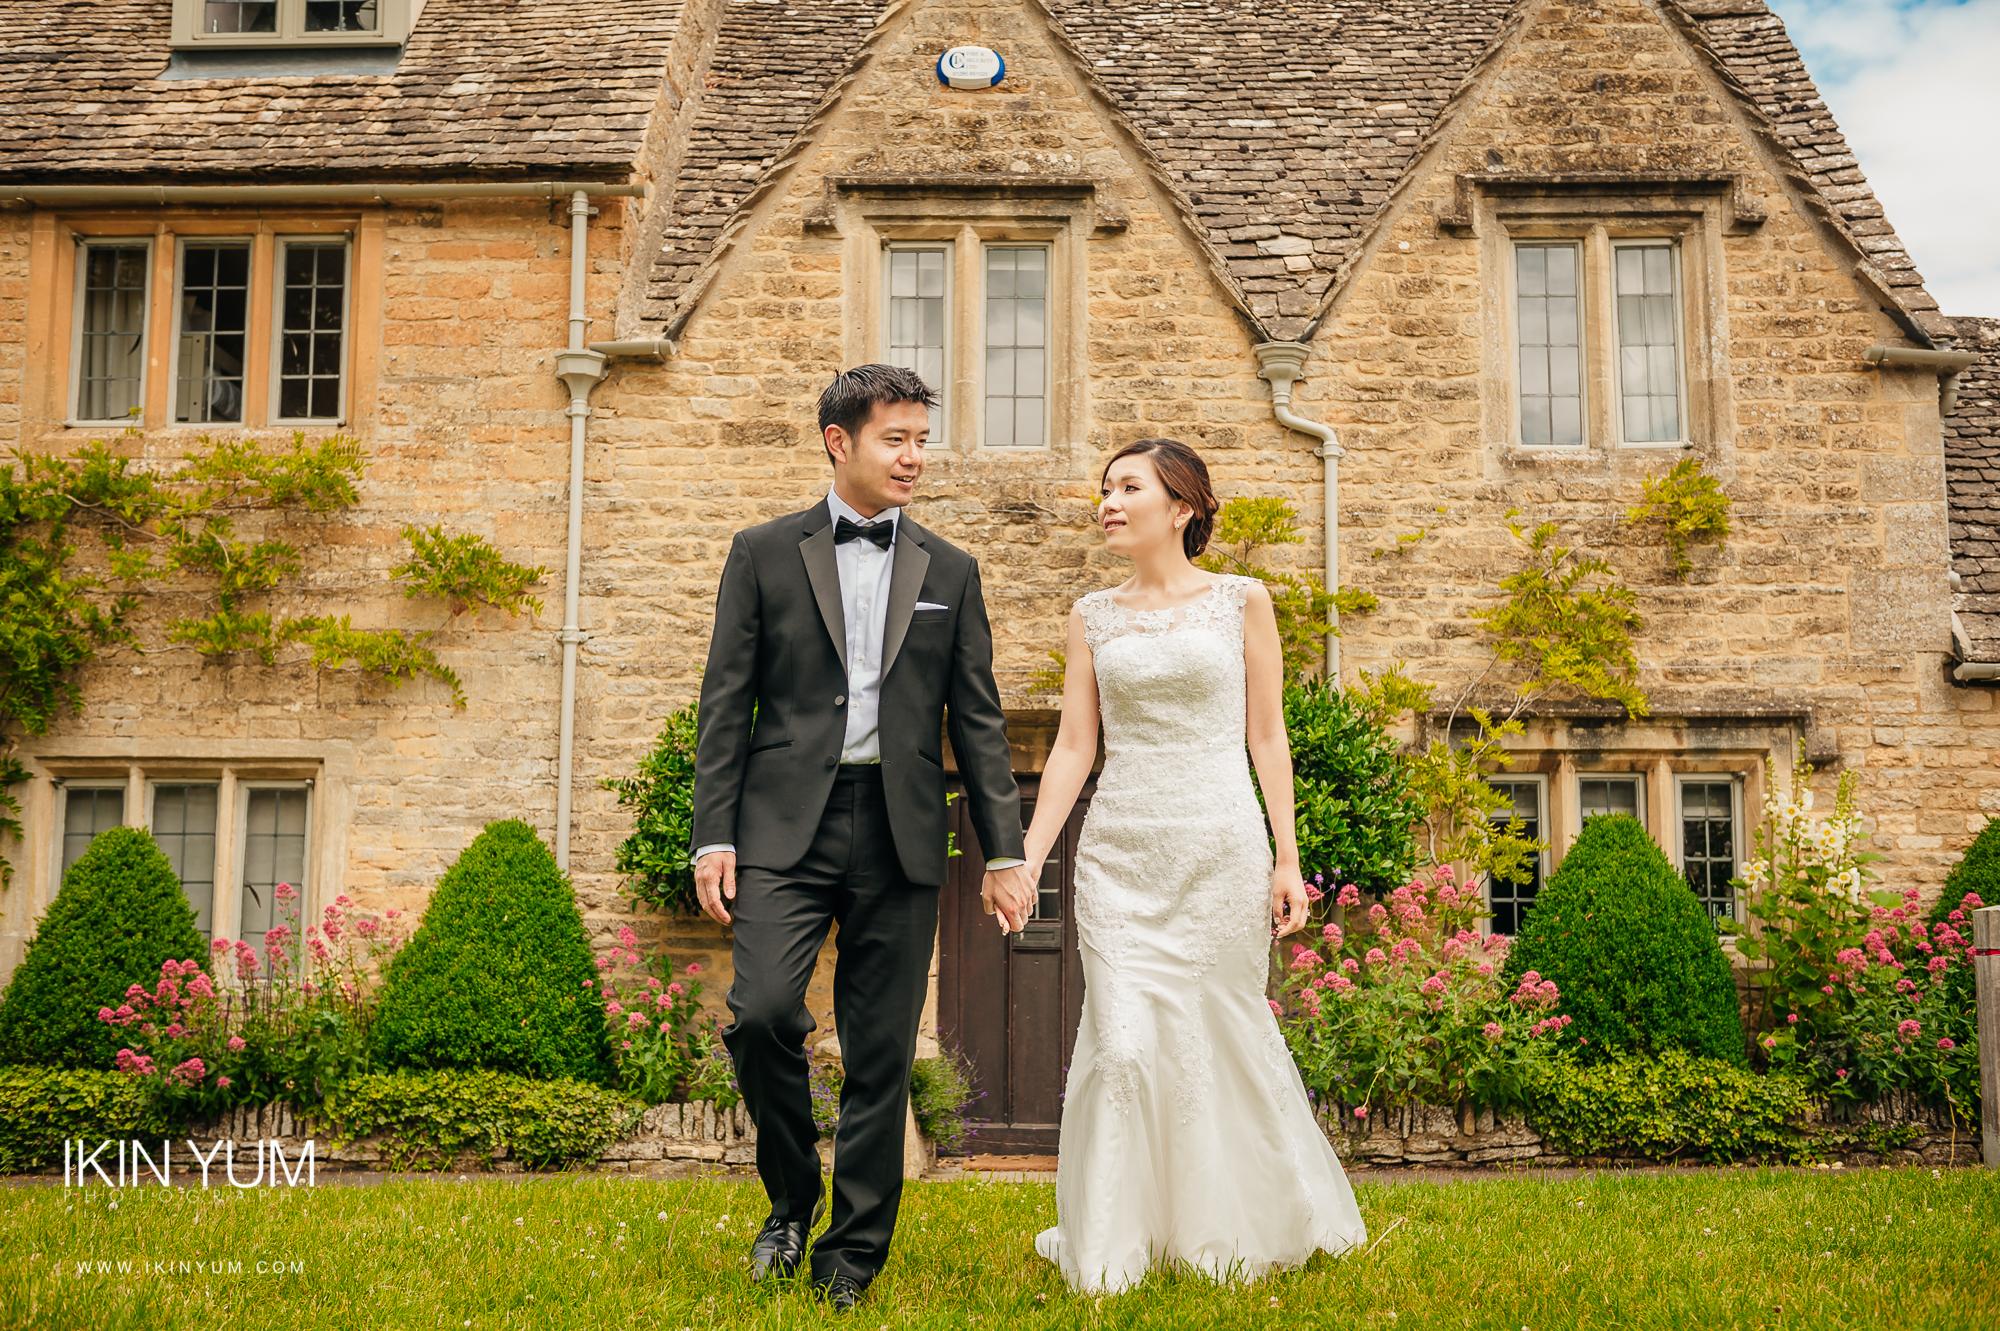 Carmen & Dennis Pre-Wedding Shoot - Ikin Yum Photography-036.jpg